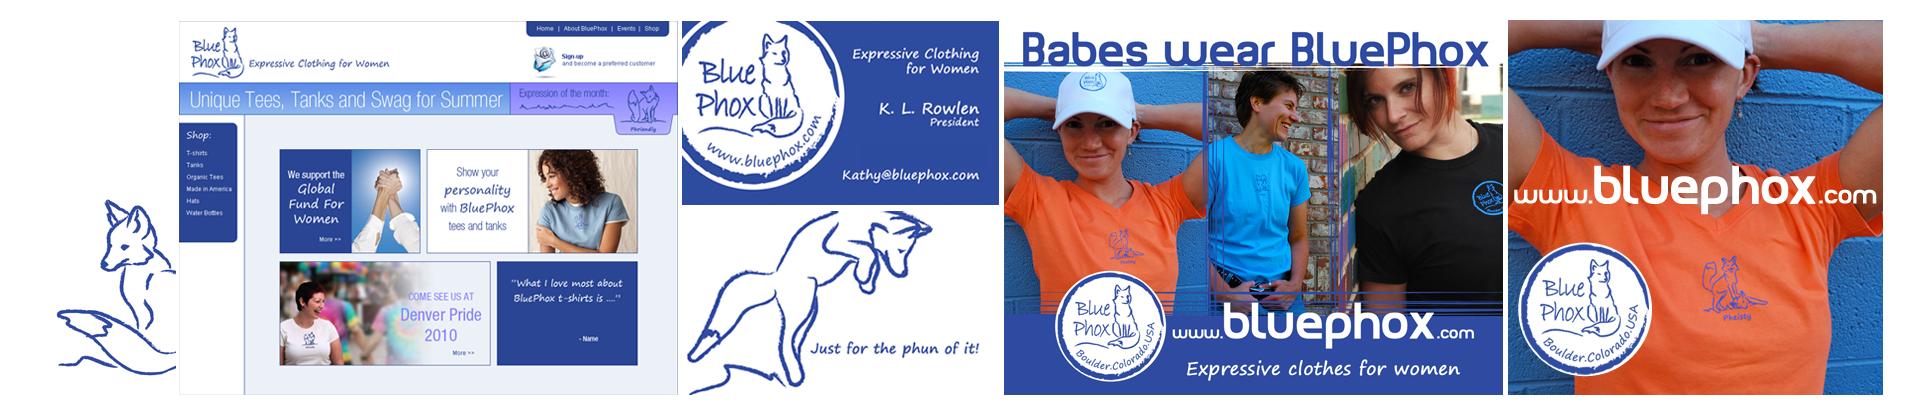 Blue Phox - Illustrations, Logo, Brand, Website & Ad